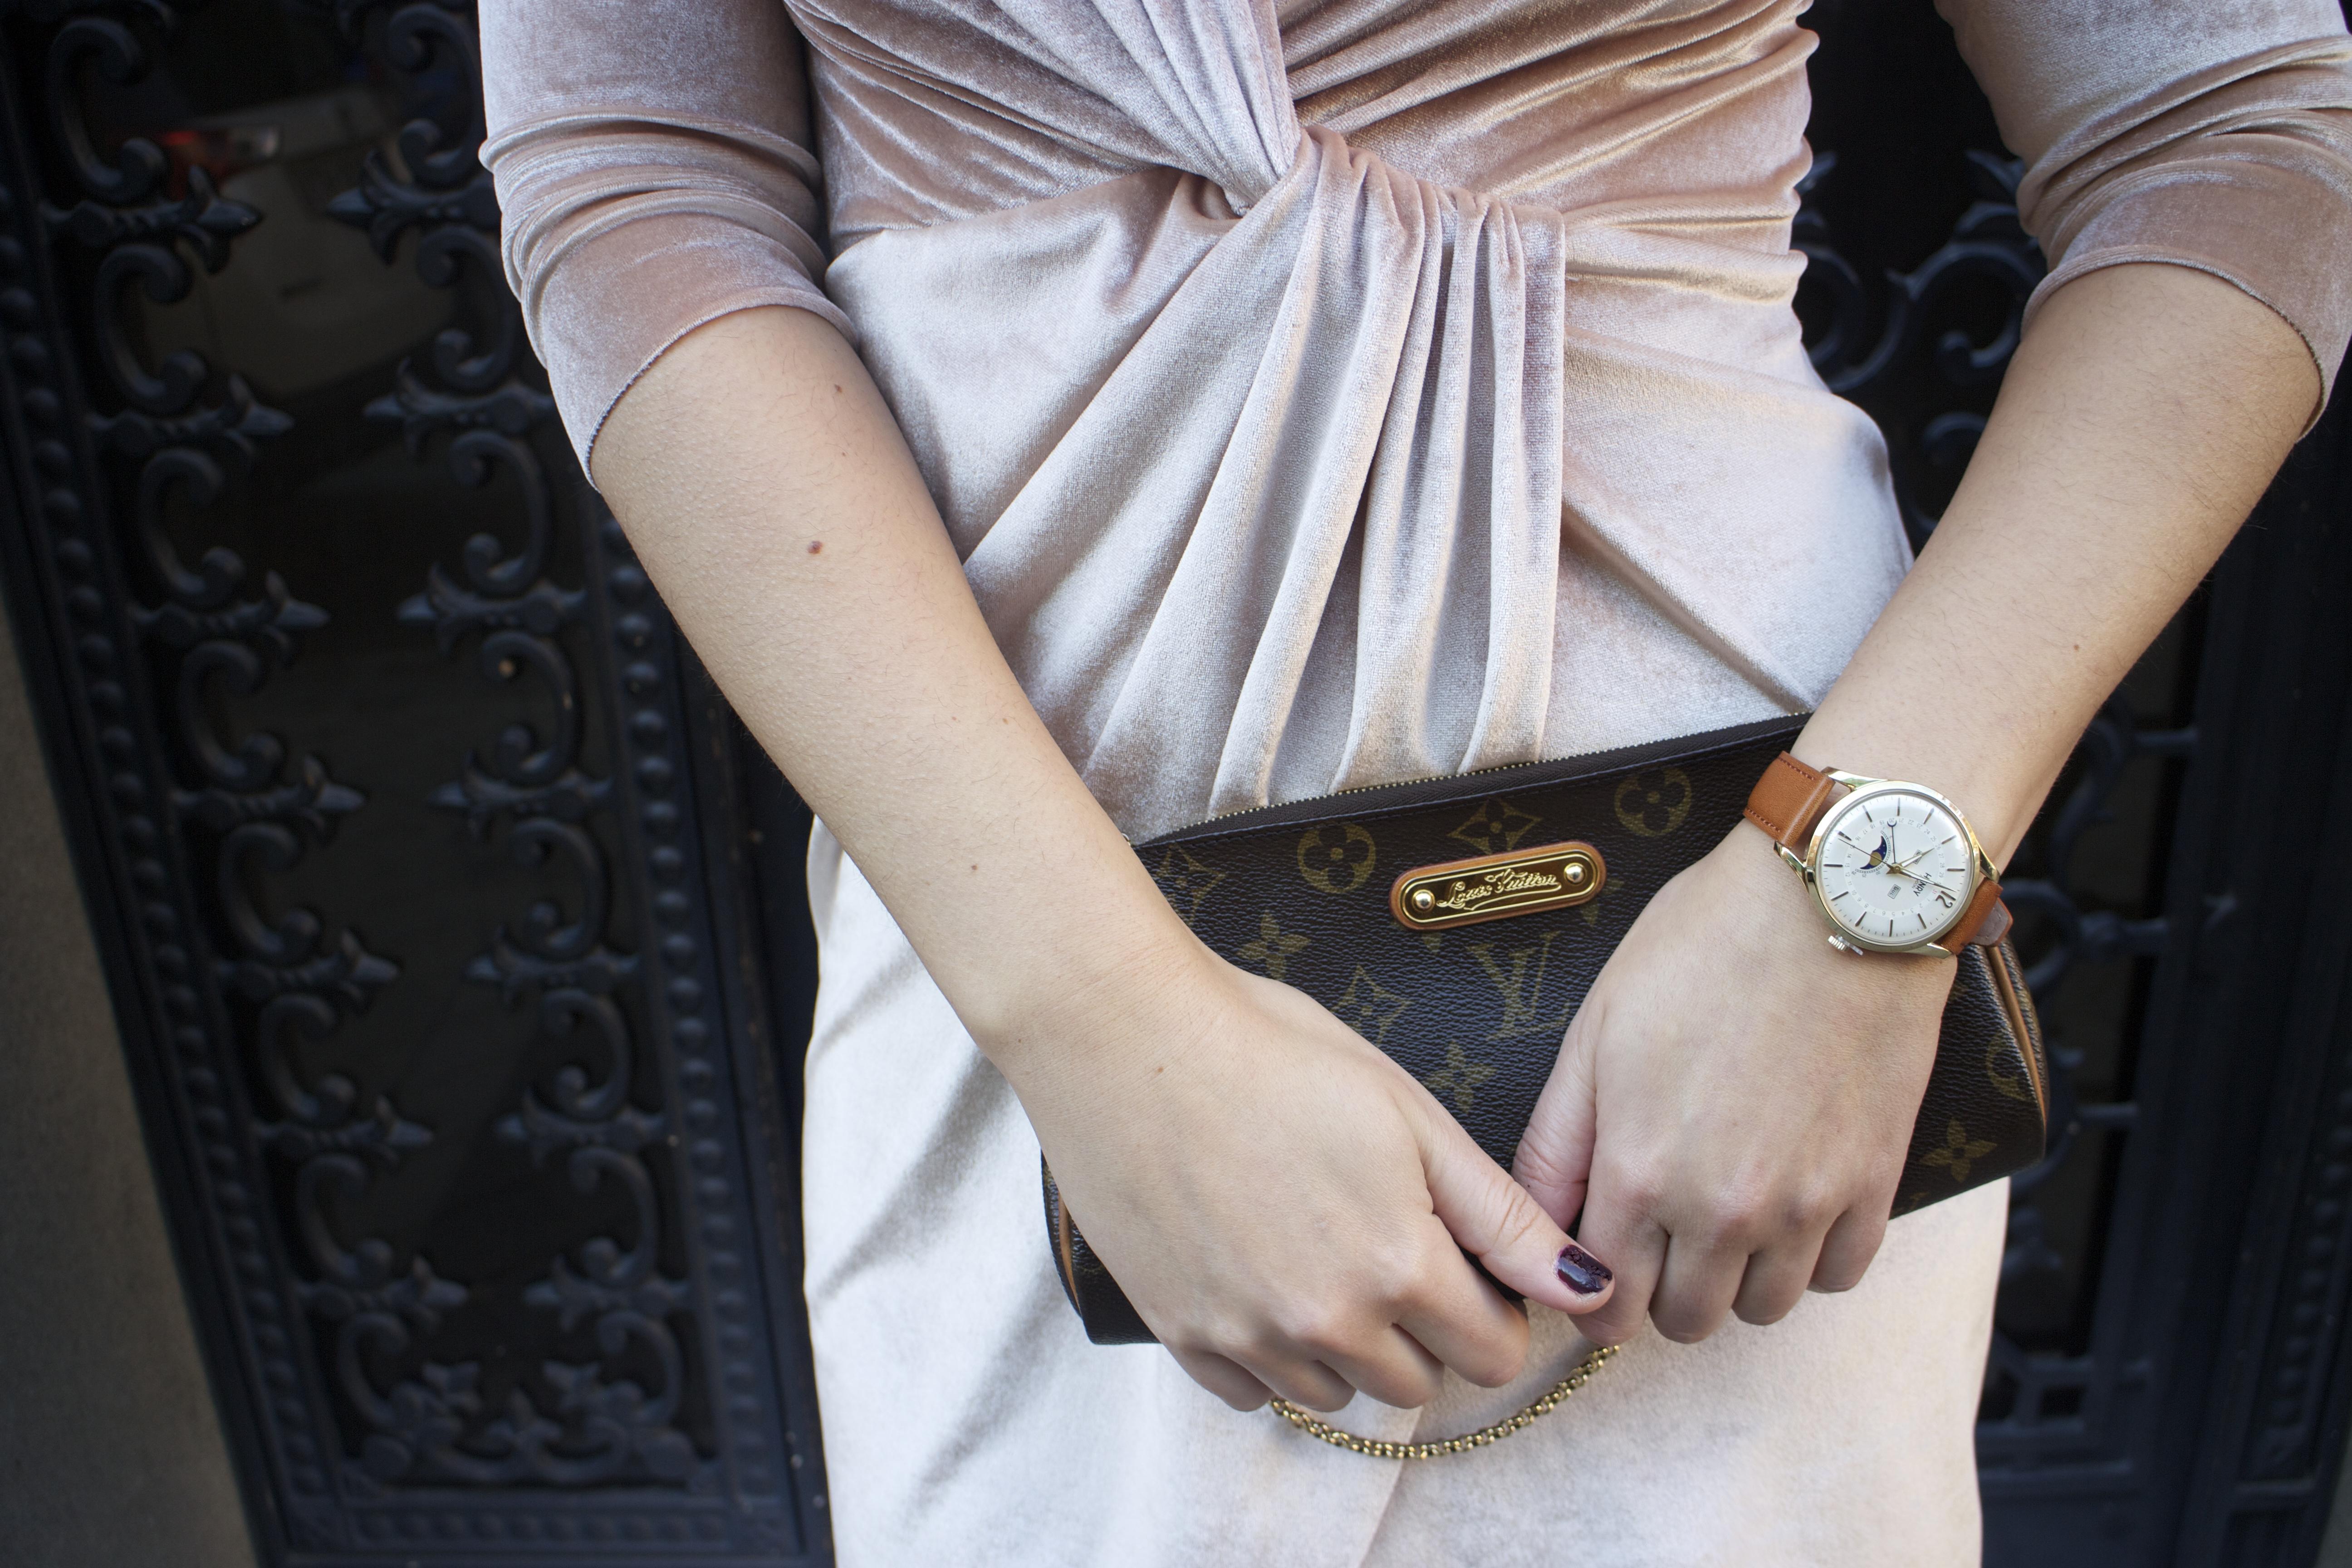 henry-london-watch-brand-embassador-pink-velvet-dress-vuitton-bag-lady-amaras-la-moda-paula-fraile13